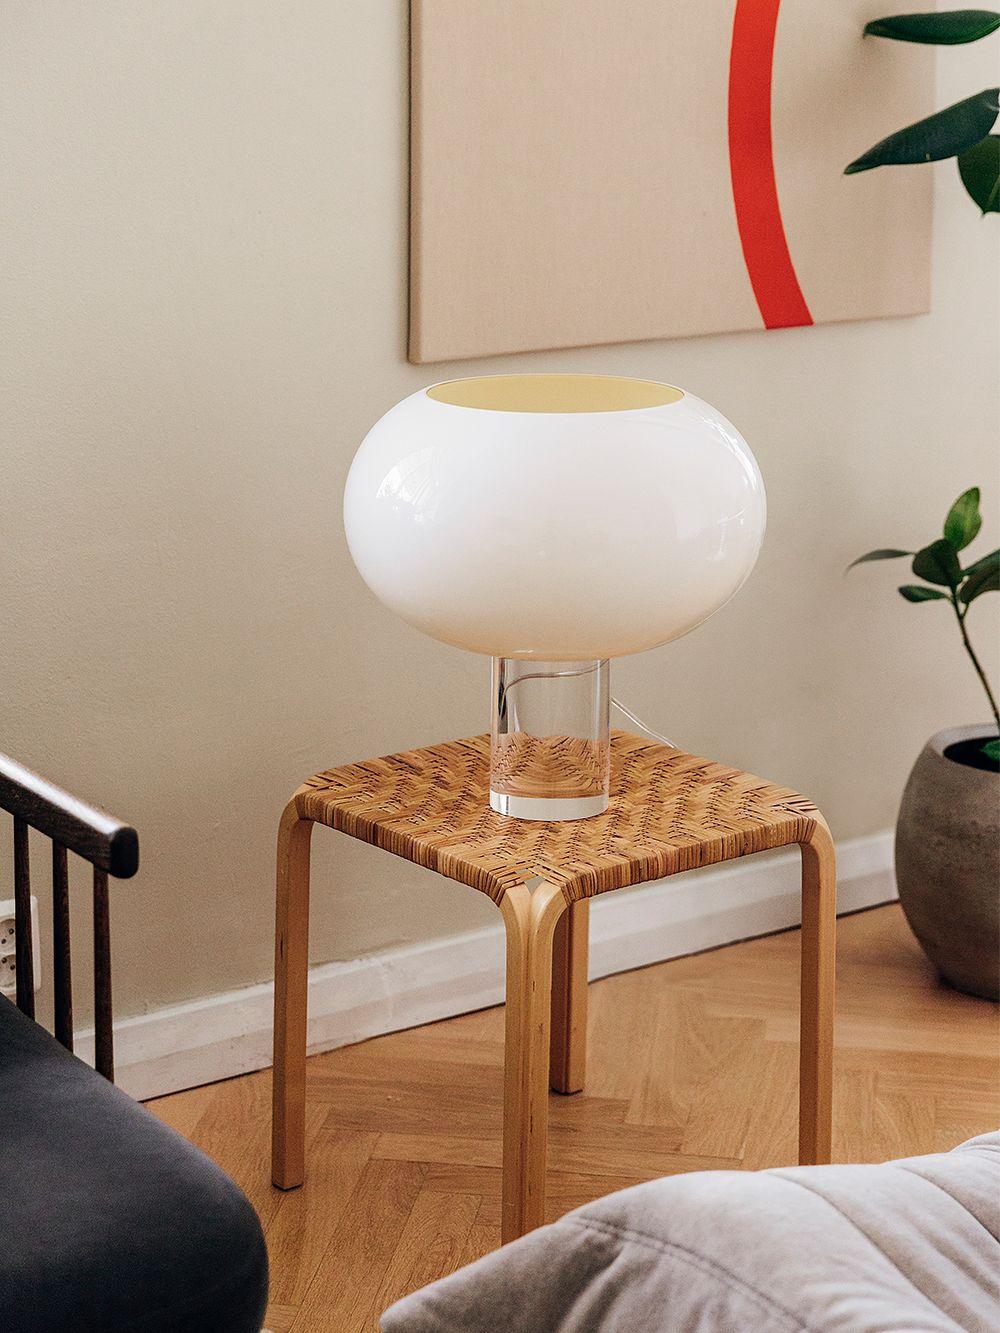 Artek Y61 rattan stool